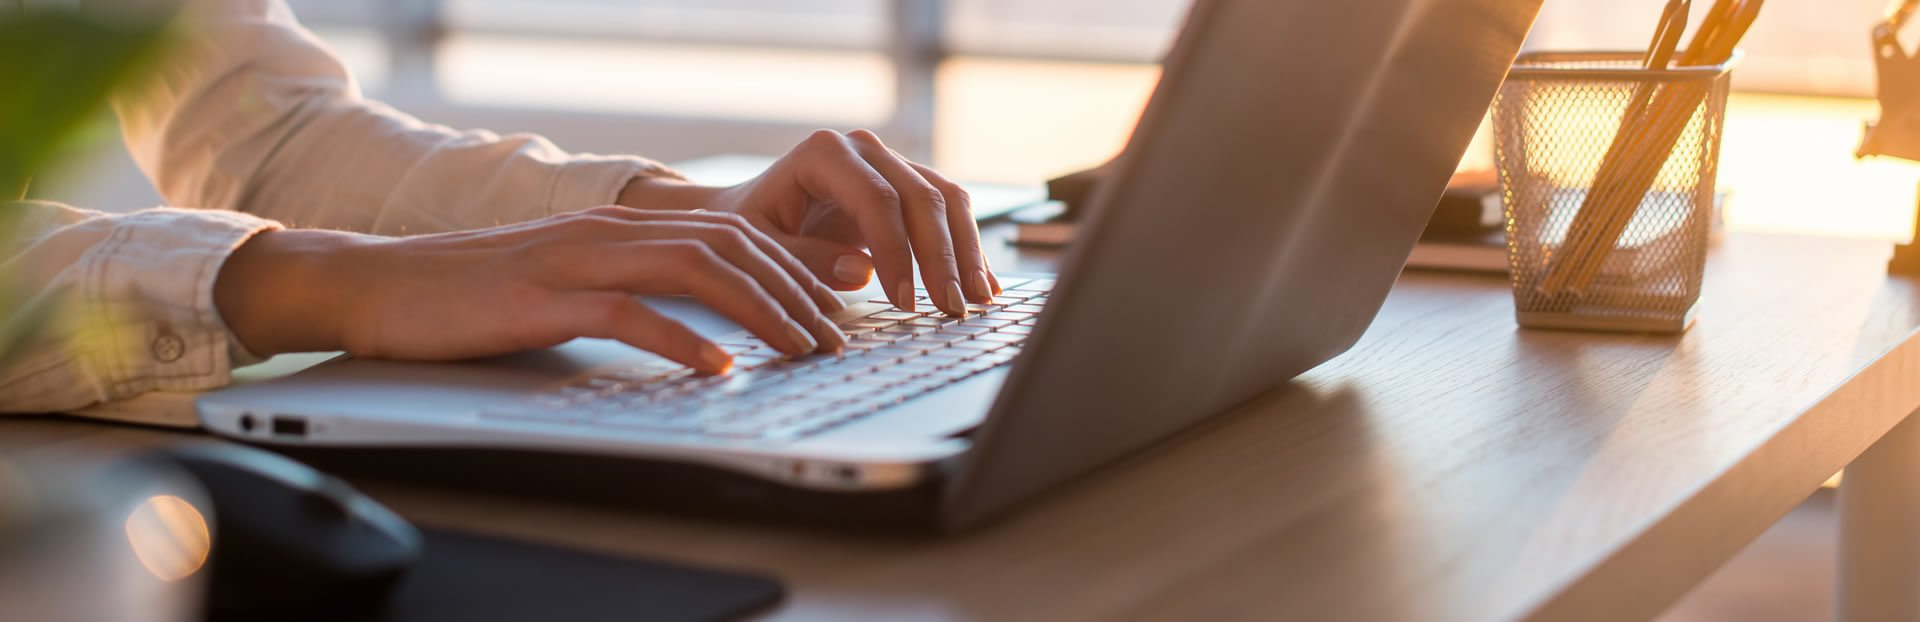 Empresa que Desenvolve Programa, Software de Nota Fiscal Eletrônica